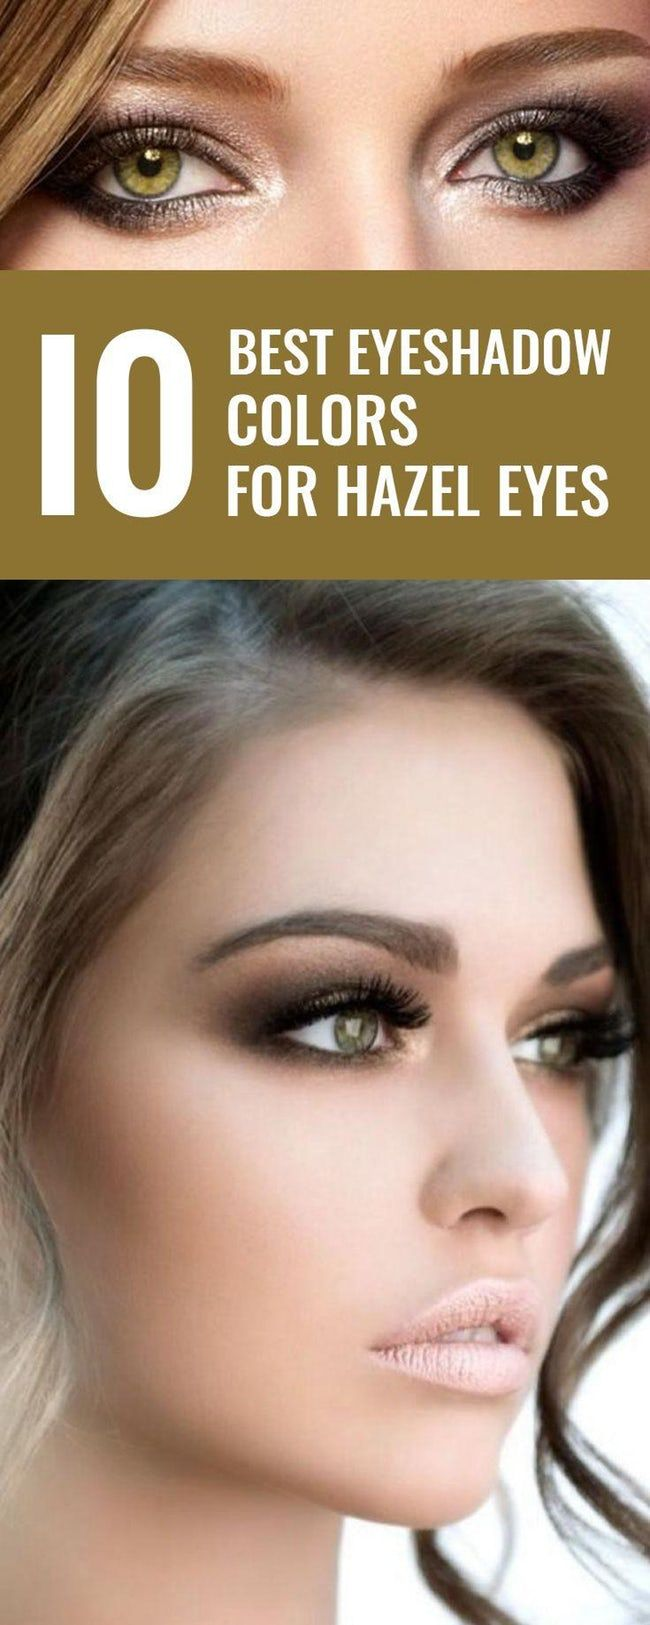 the 10 best eyeshadow colors for hazel eyes | cosmetics | hazel eye